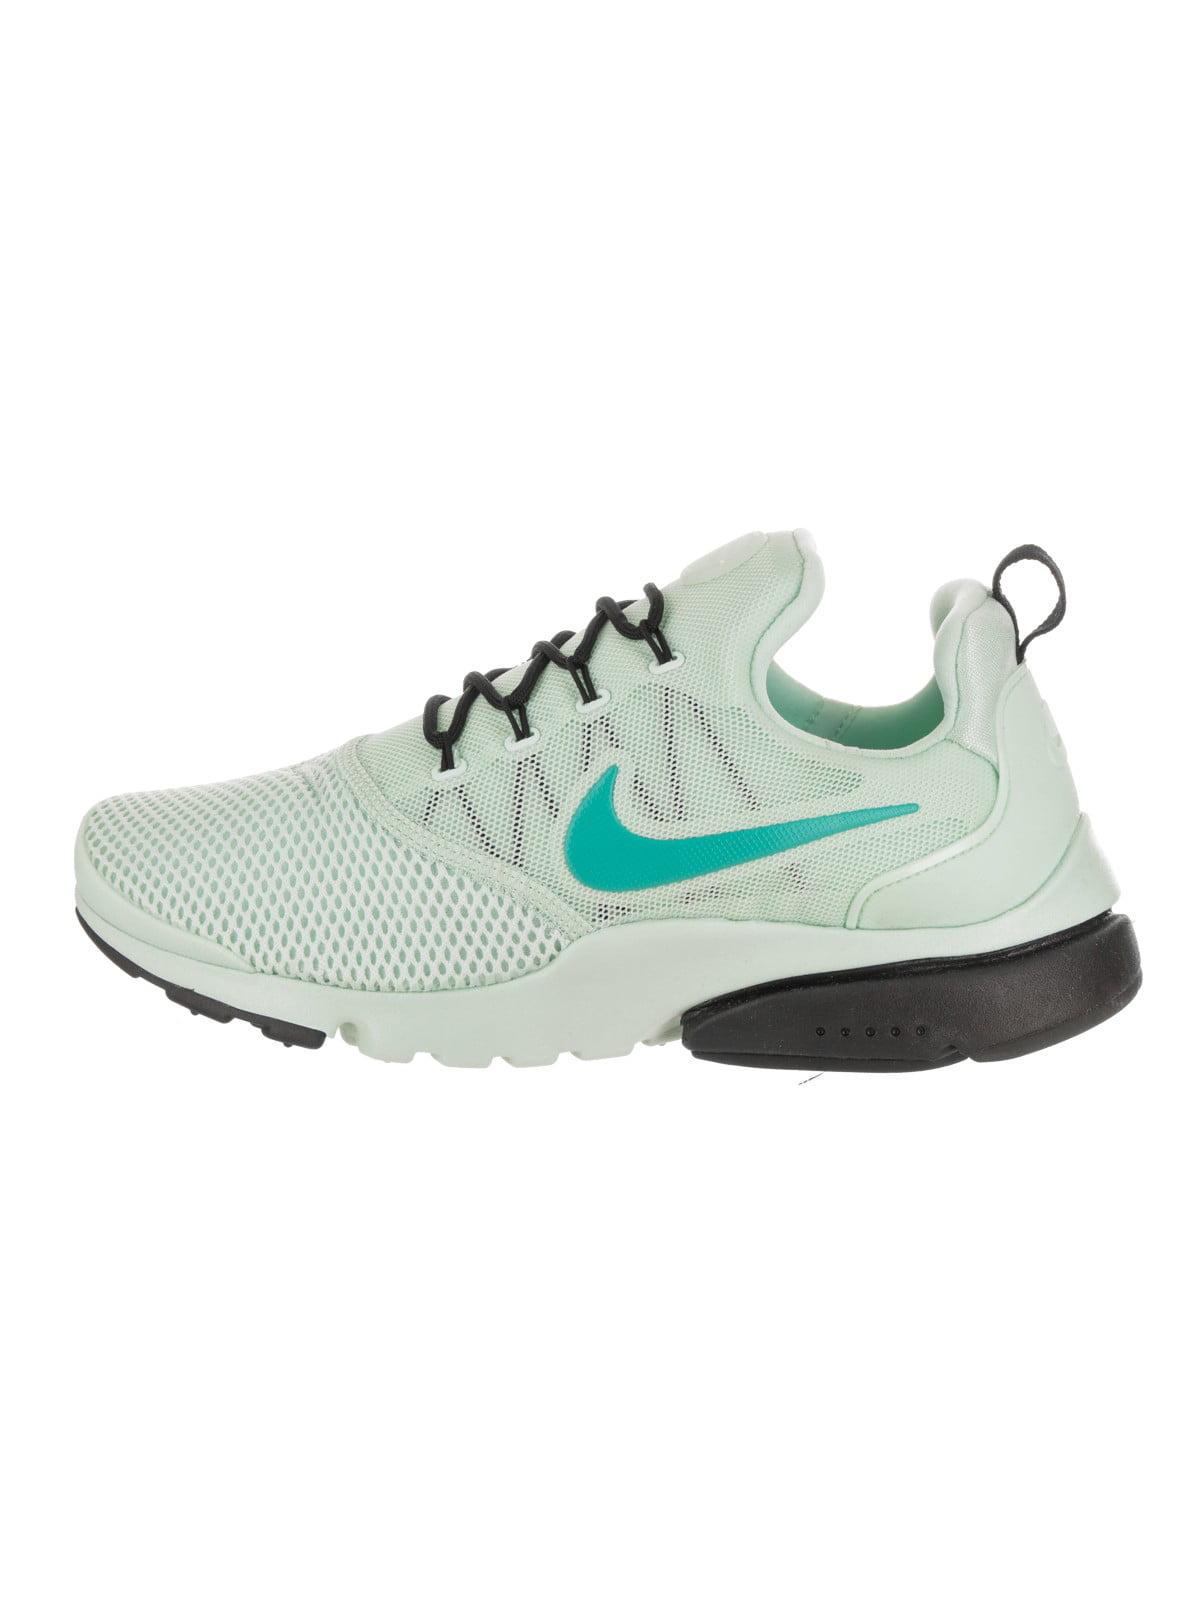 Nike Presto Fly Igloo/Clear Jade-Black Mint Women's Running Shoes 910569-300